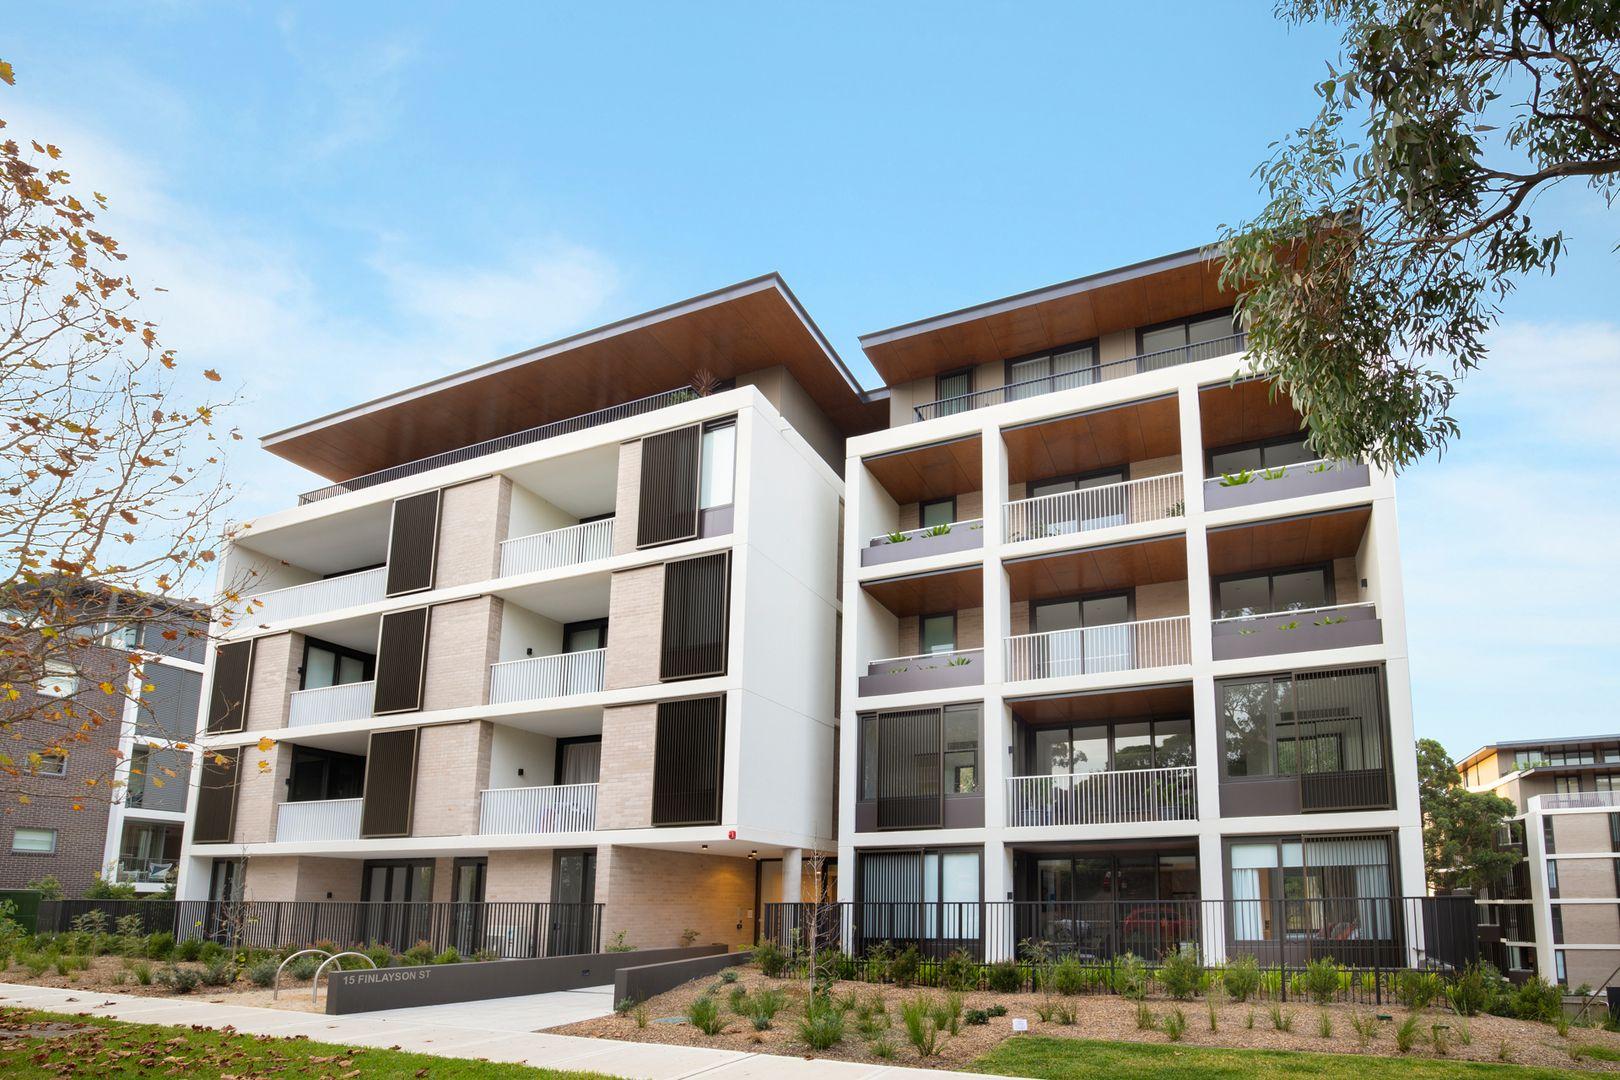 18-22 Birdwood Avenue, Lane Cove NSW 2066, Image 0